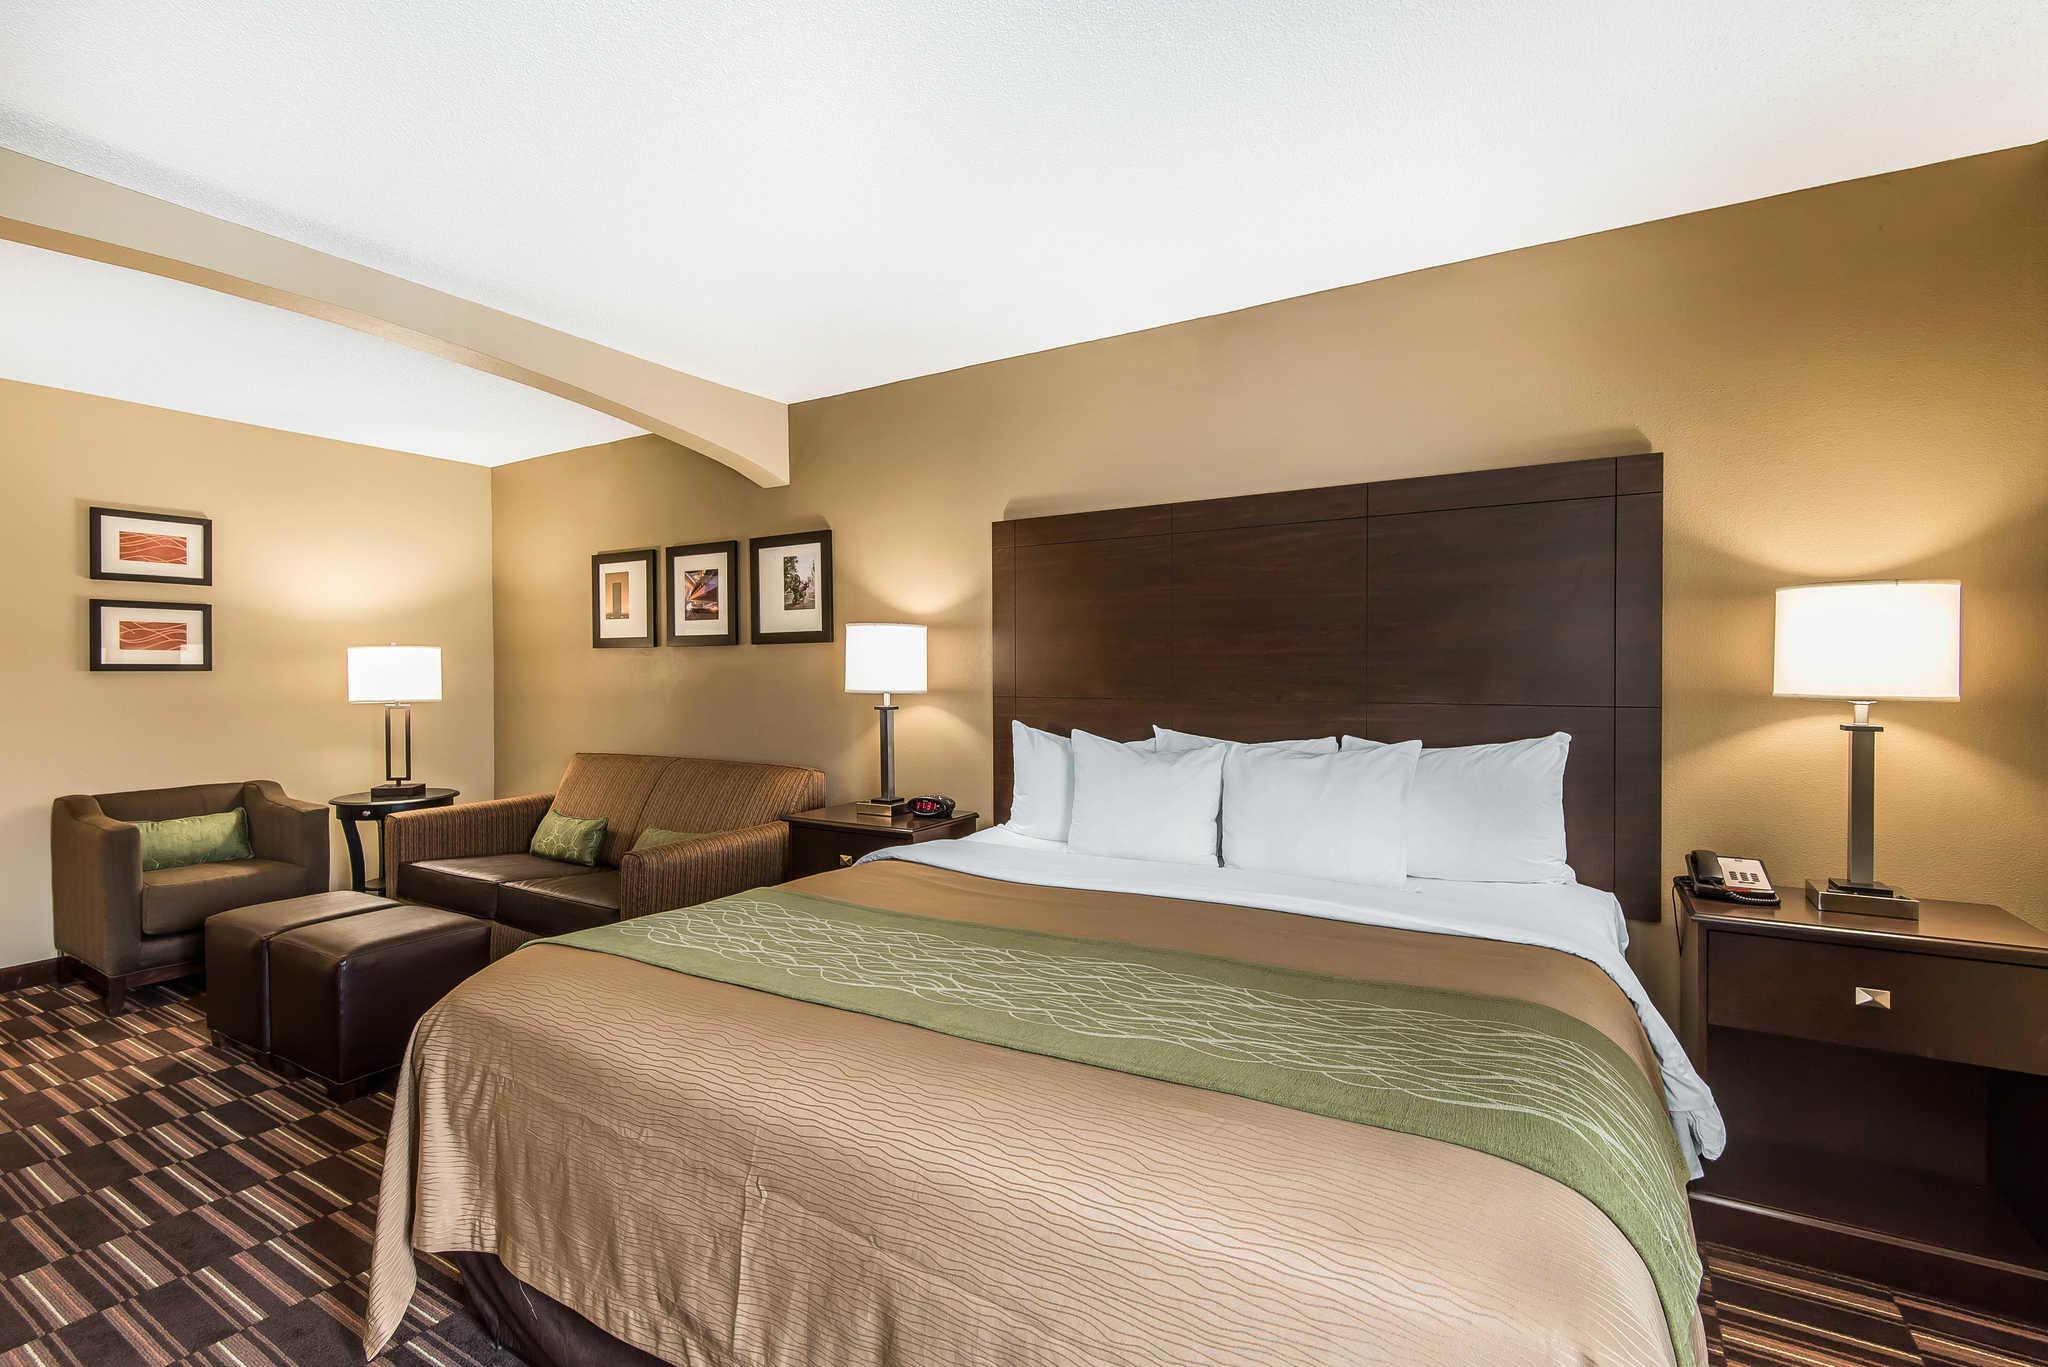 Comfort Inn & Suites Kansas City - Northeast image 20